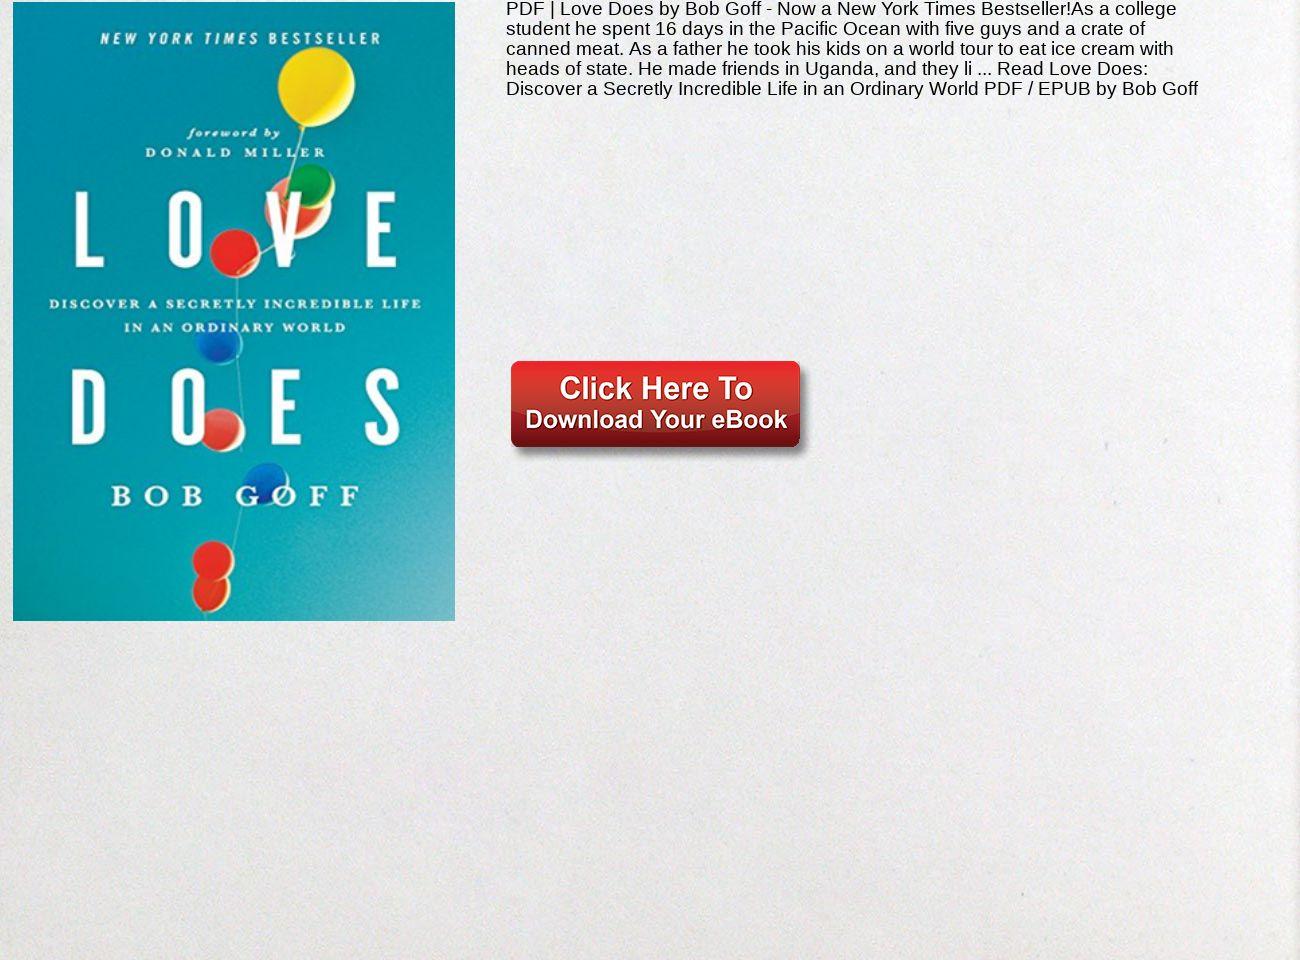 Love Does Bob Goff Pdf